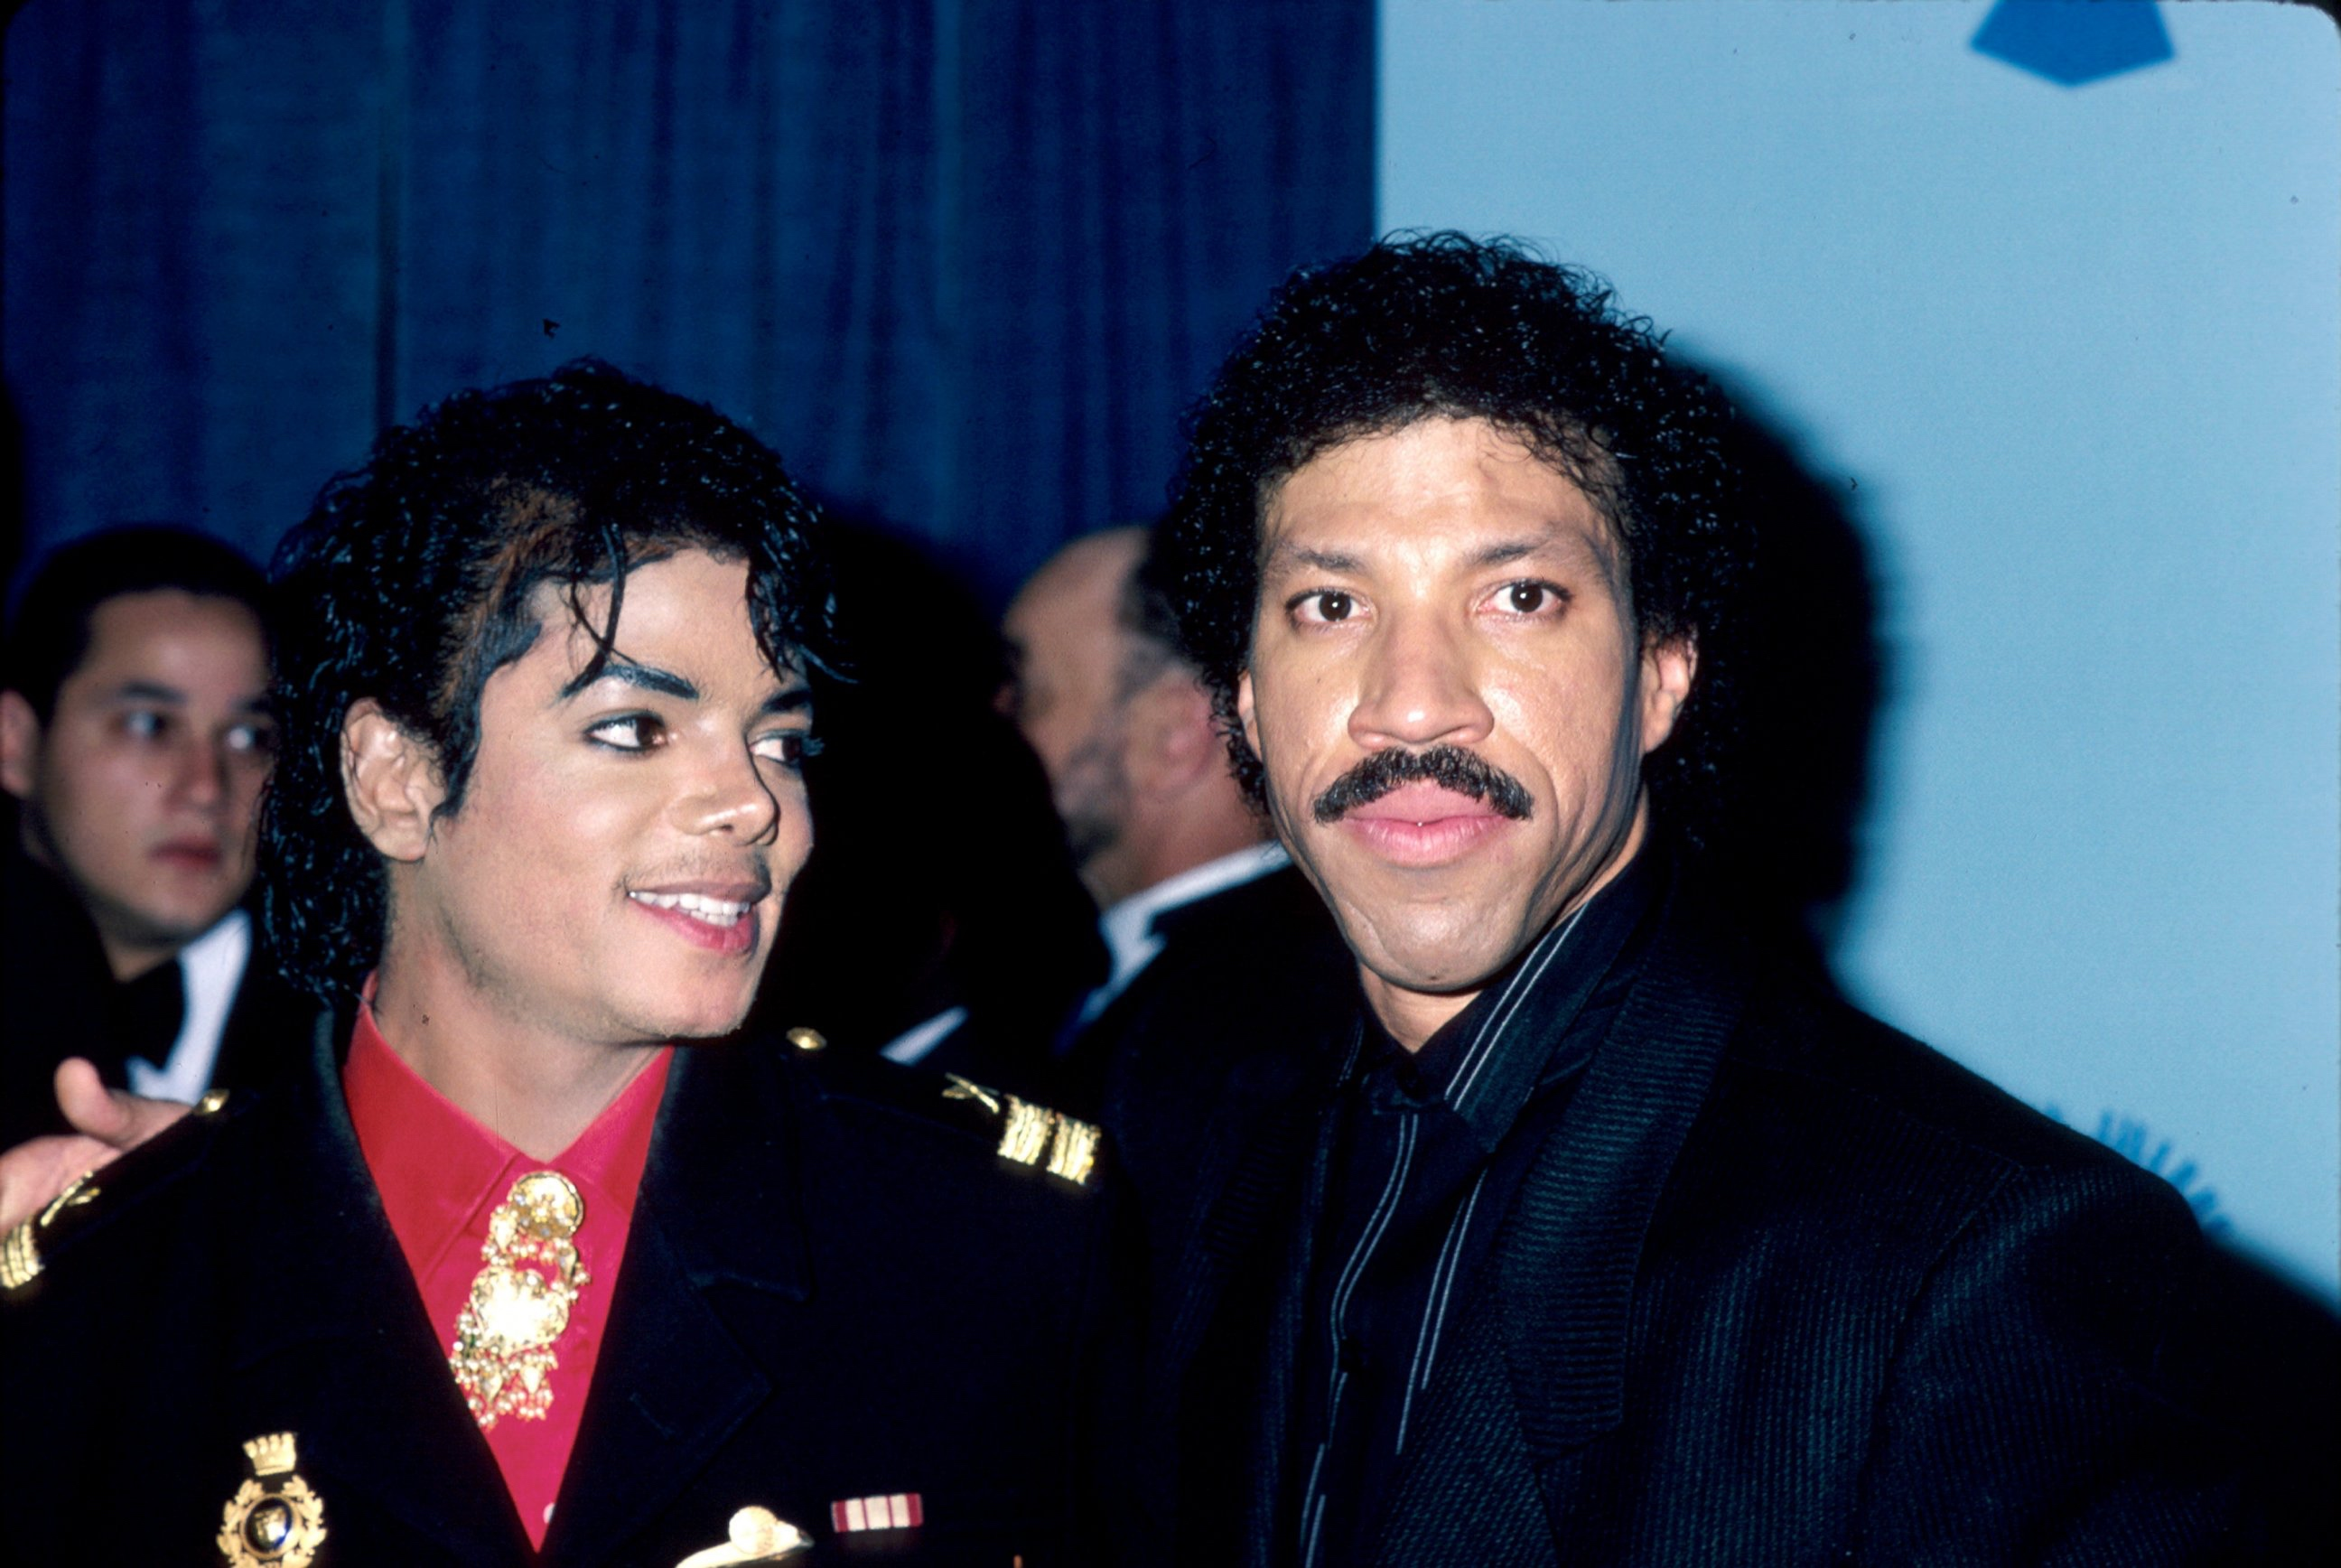 Lionel & Michael